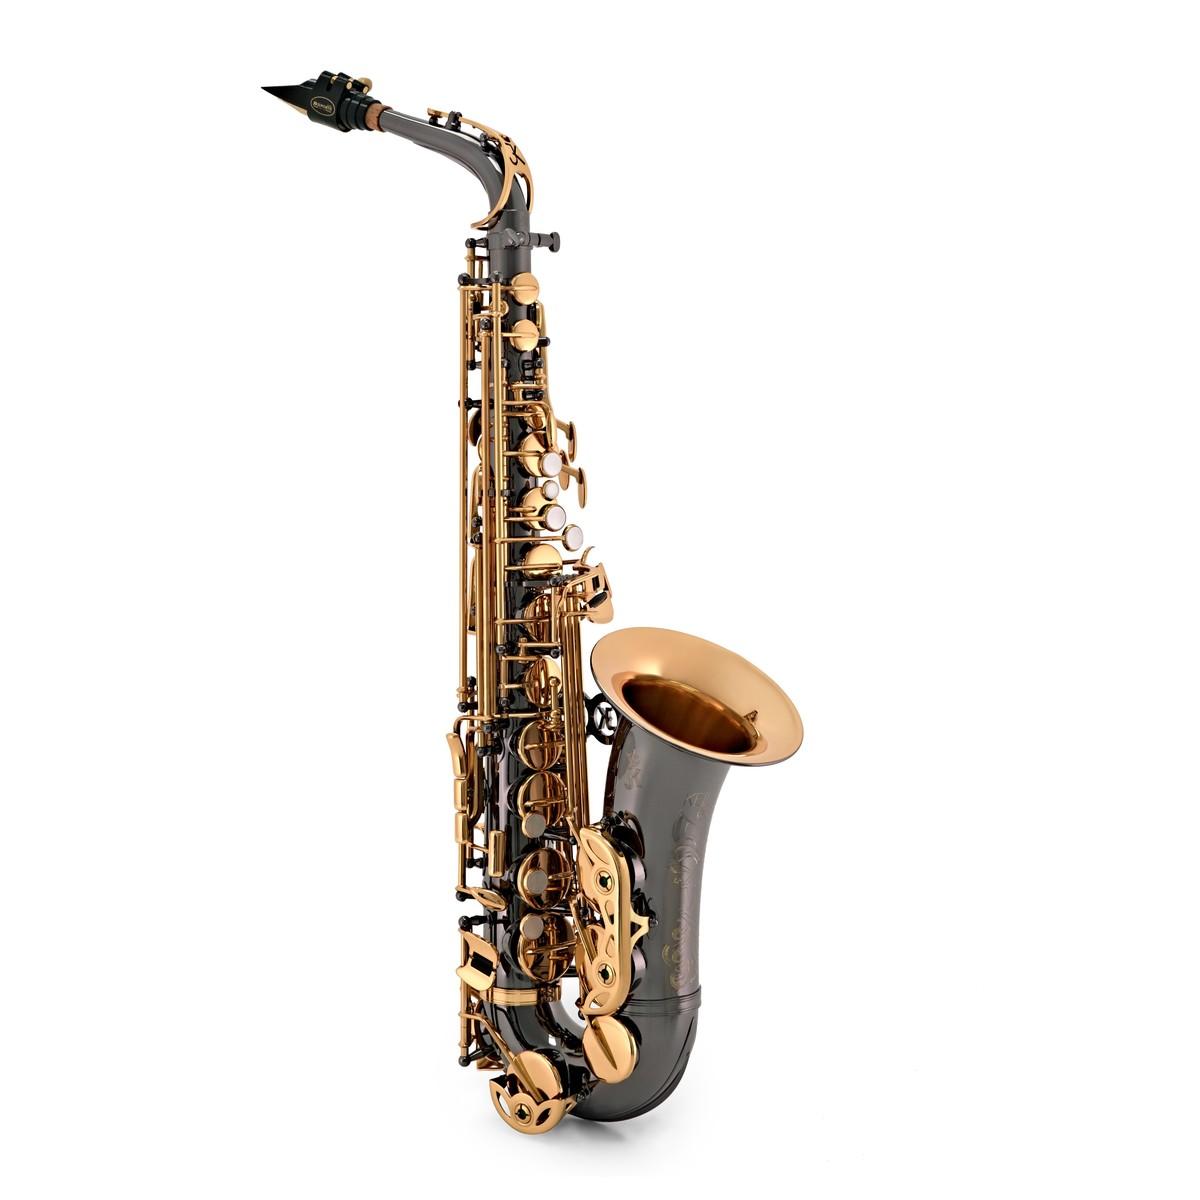 Keilwerth MKX Alto Saxophone, Black Nickel